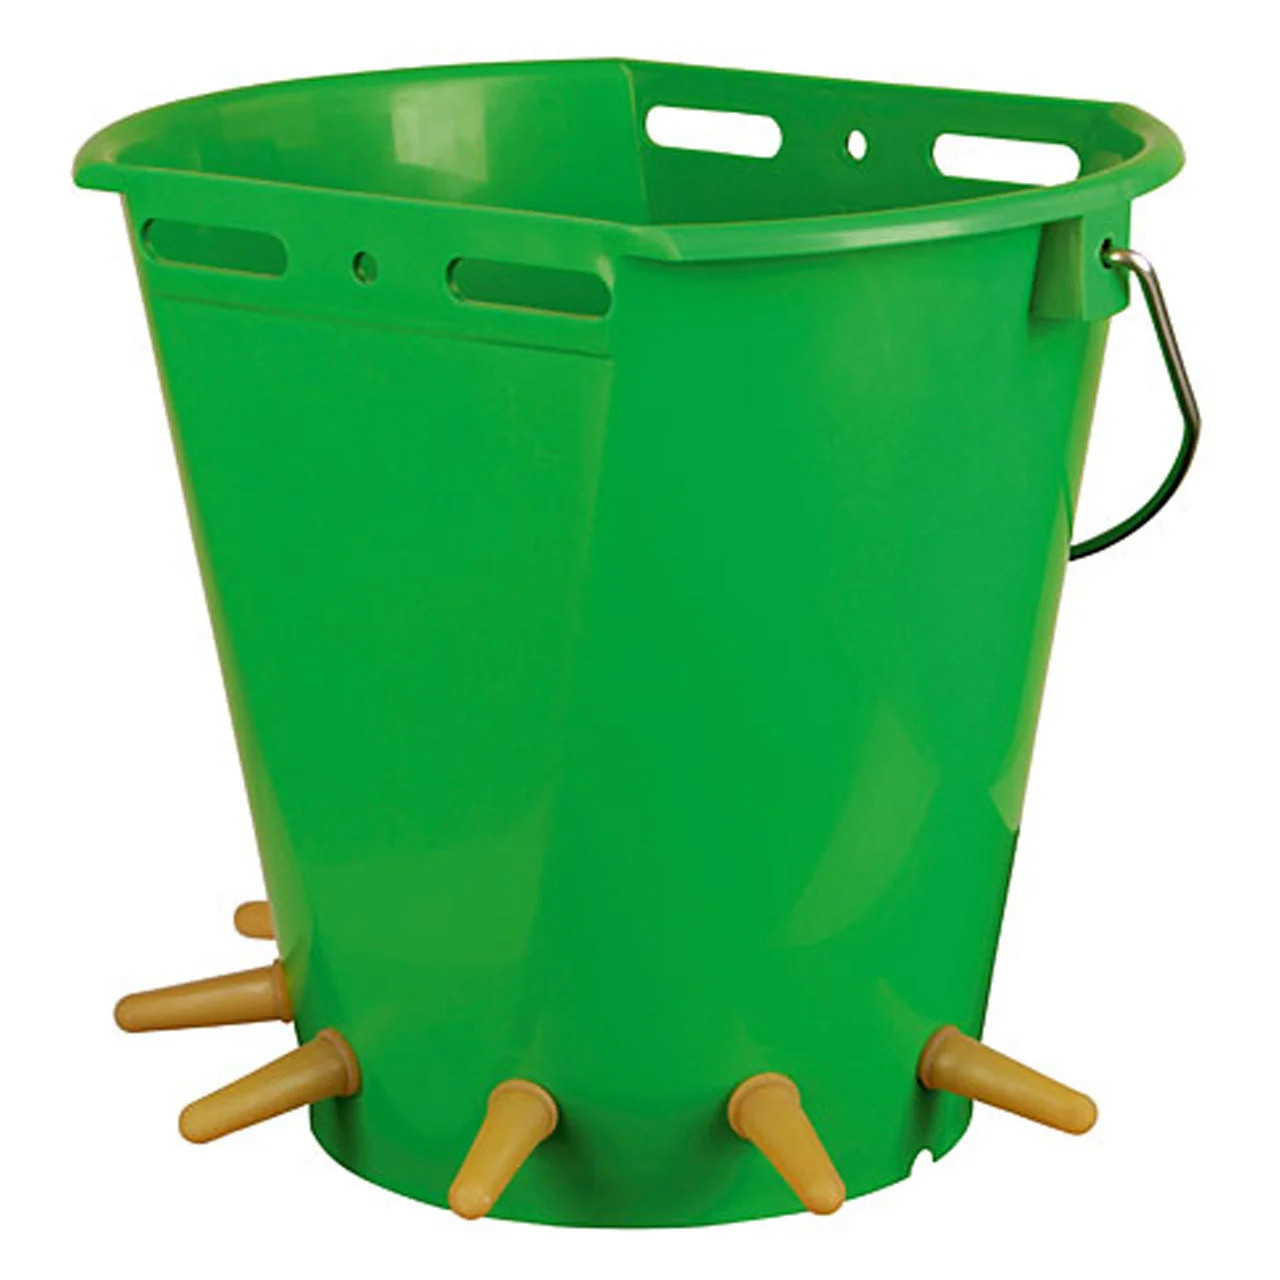 Пластиковое ведро-кормушка с сосками для молодняка